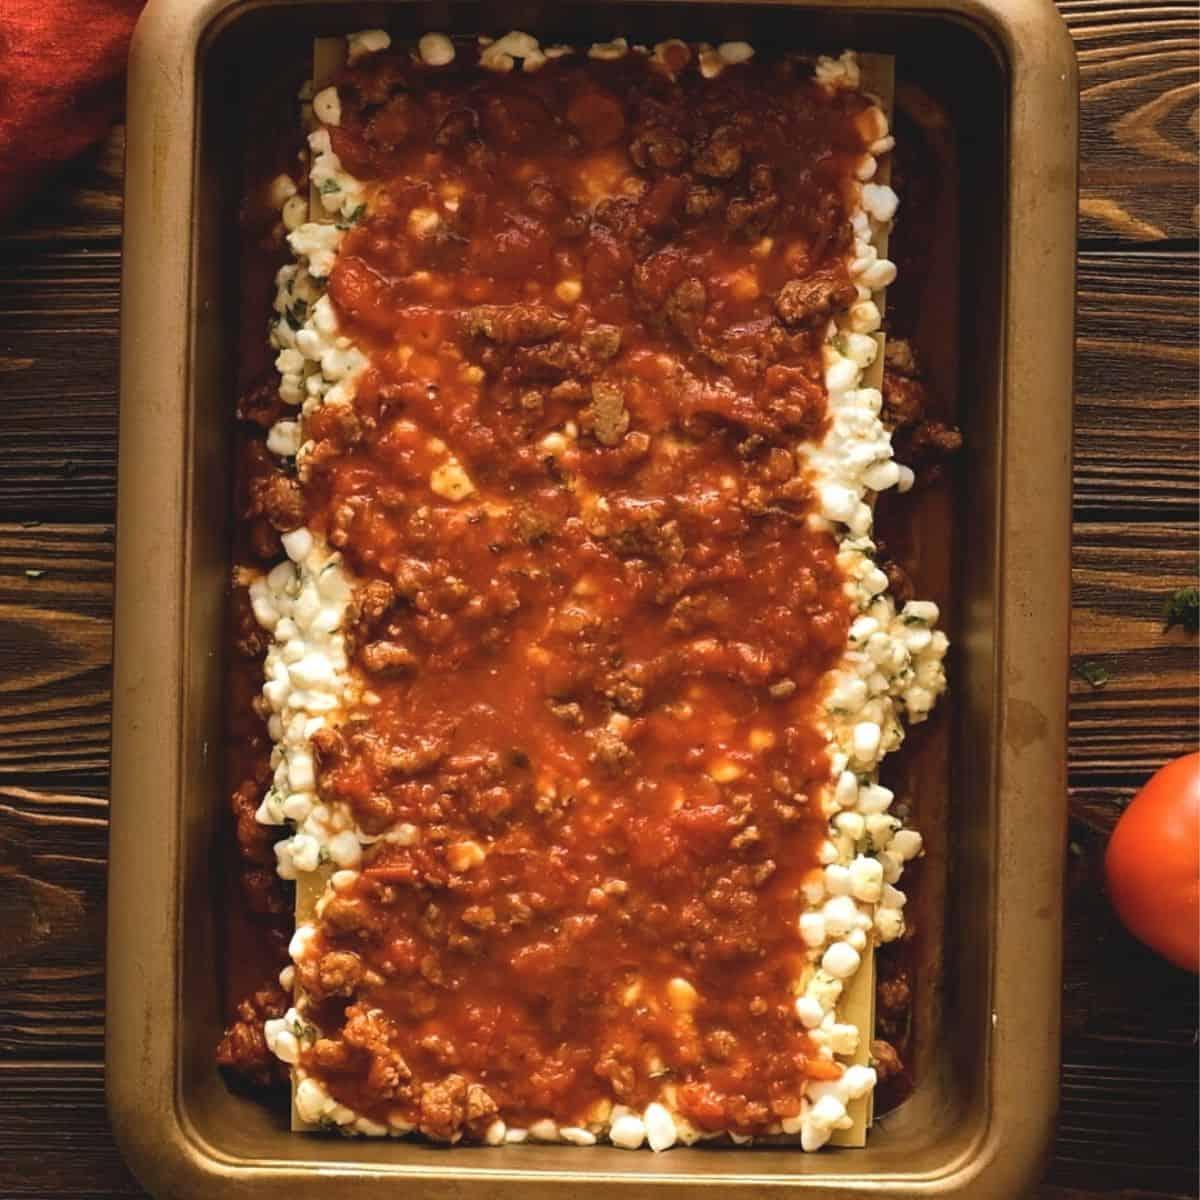 Layered lasagna in 9x18 baking pan.